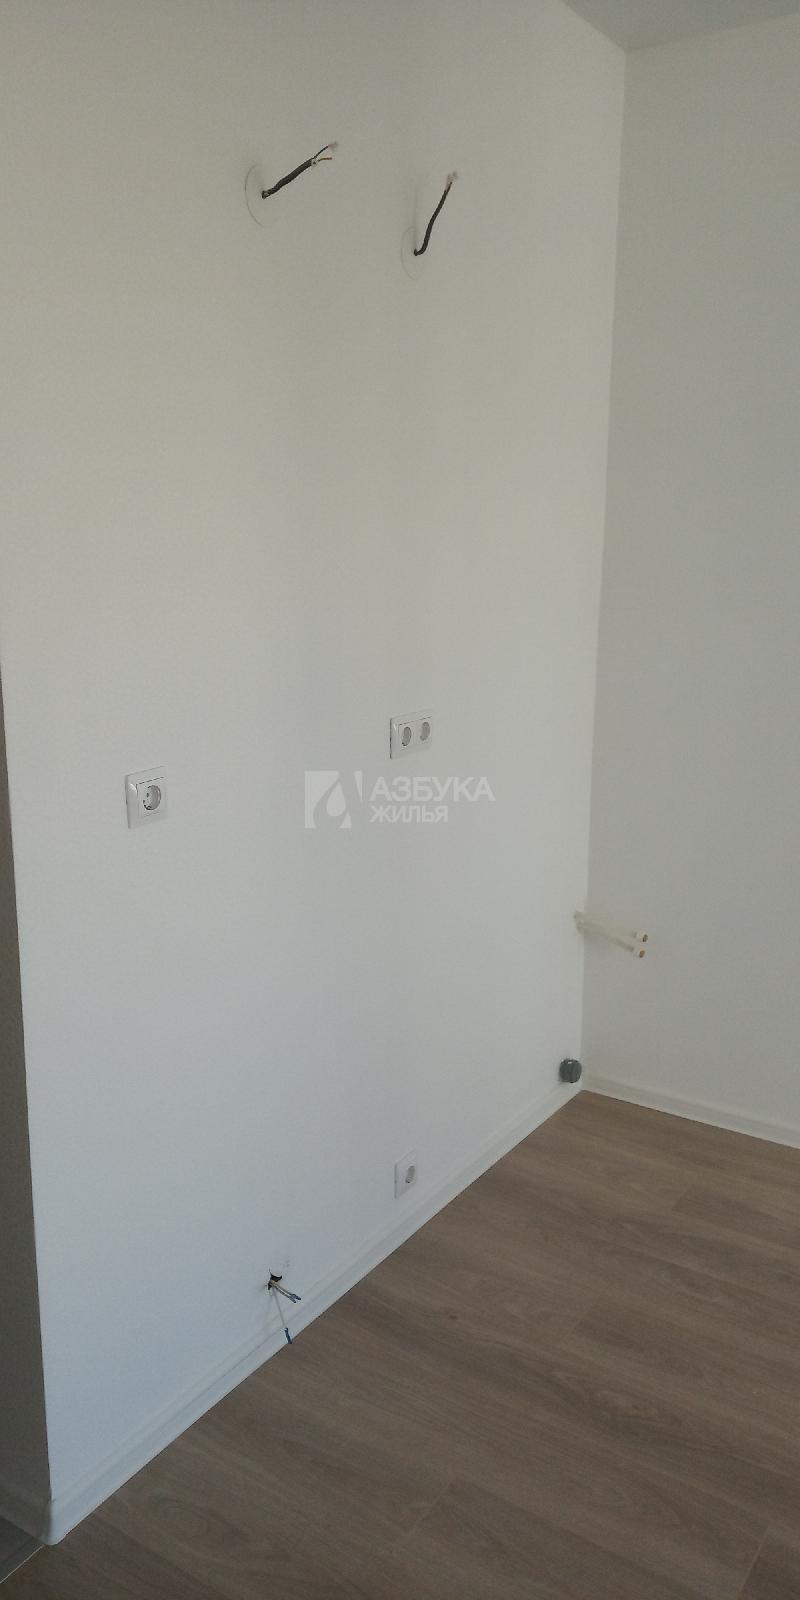 Фото №2 - 1-комнатная квартира, Дрожжино, Южная улица 9 корпус 1, метро Бульвар Дмитрия Донского